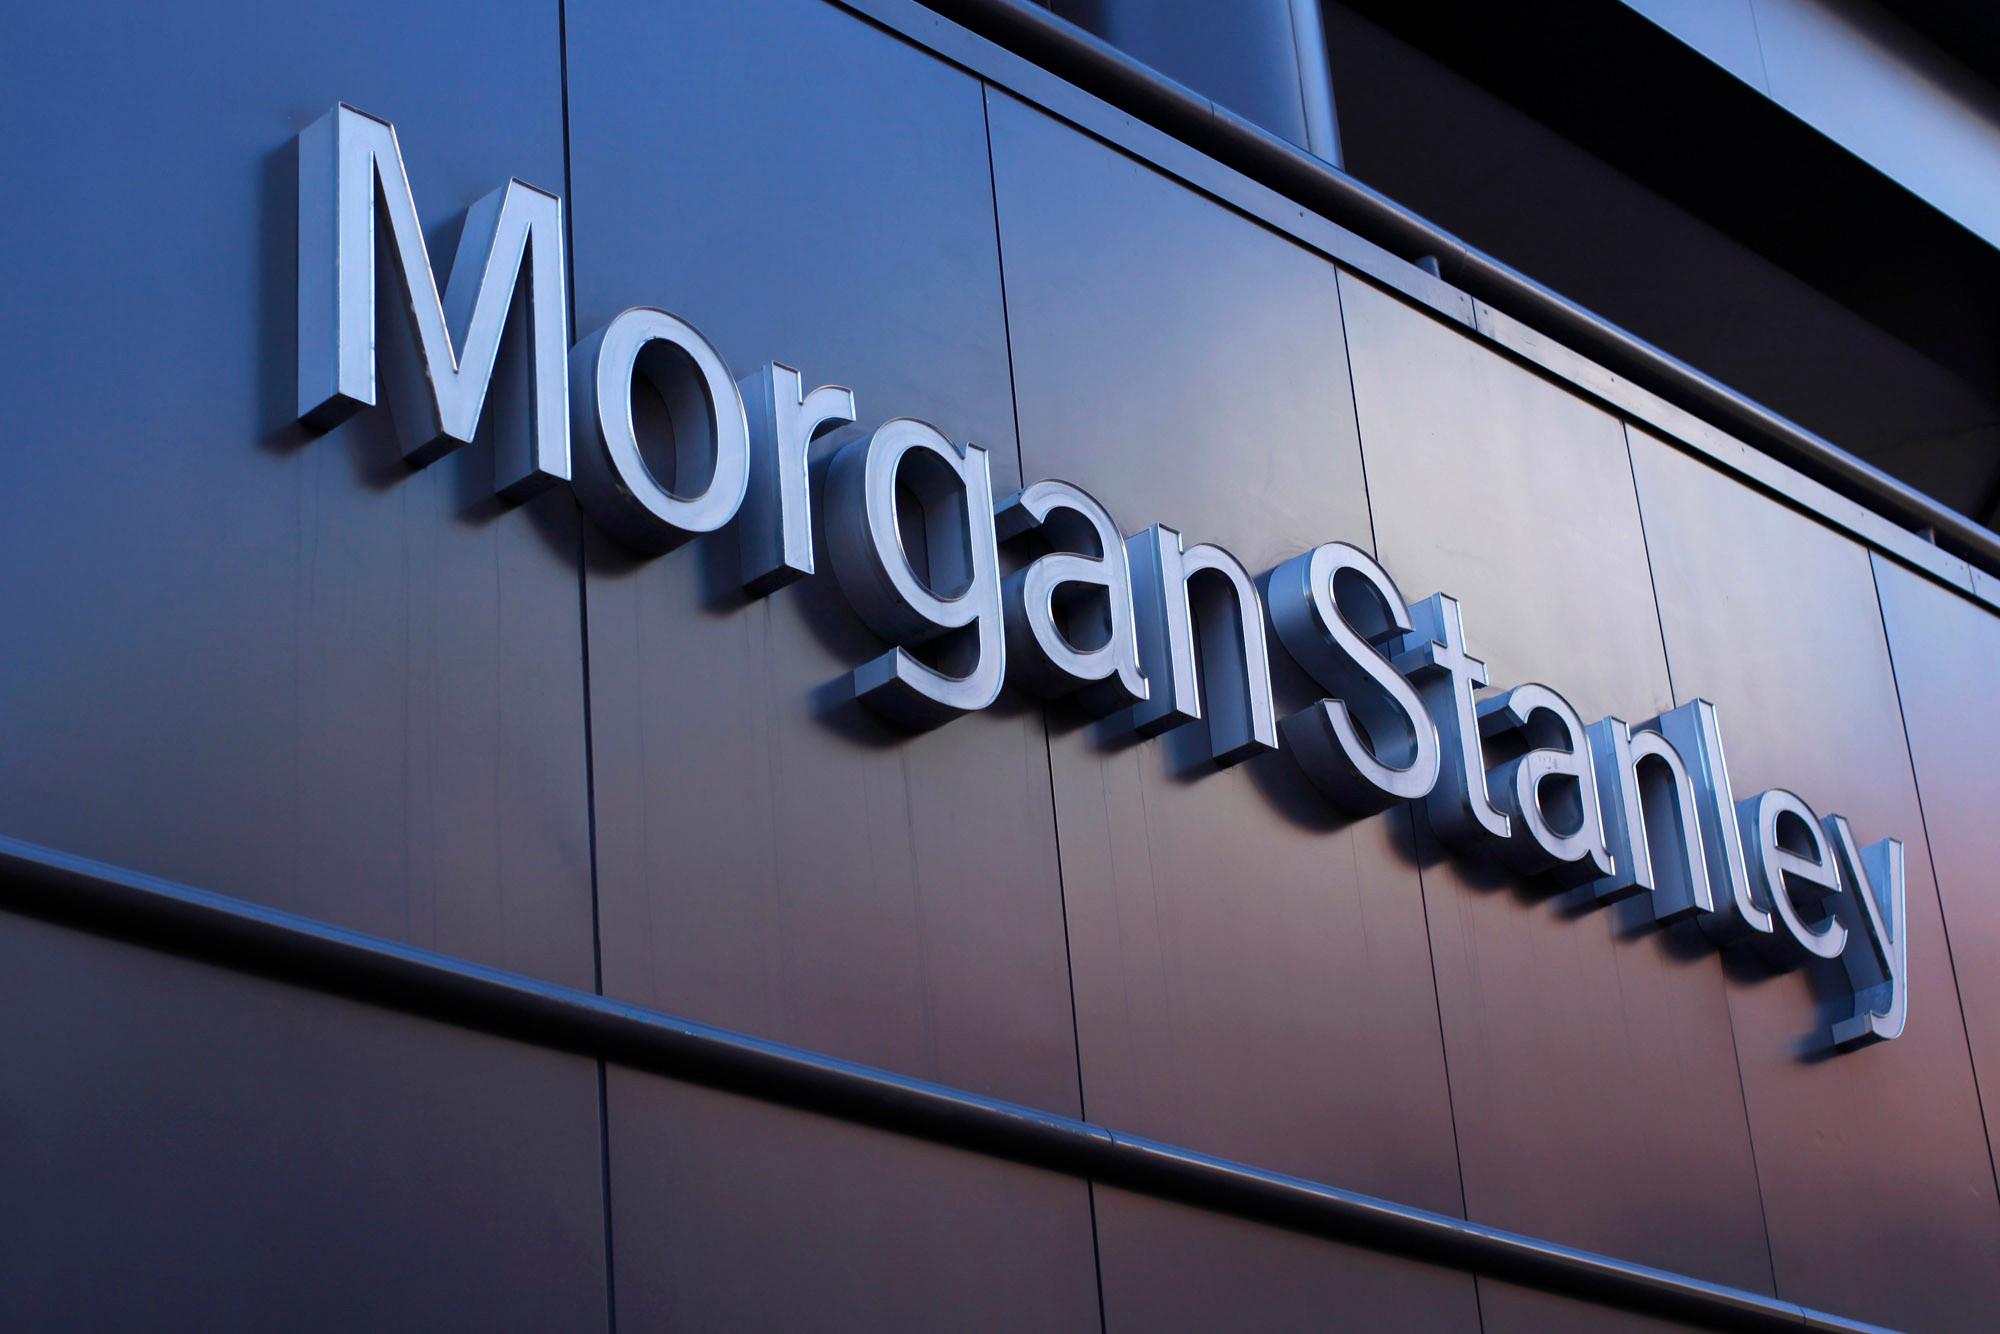 Morgan Stanley Wall Street'te yüzde 15 düzeltme bekliyor